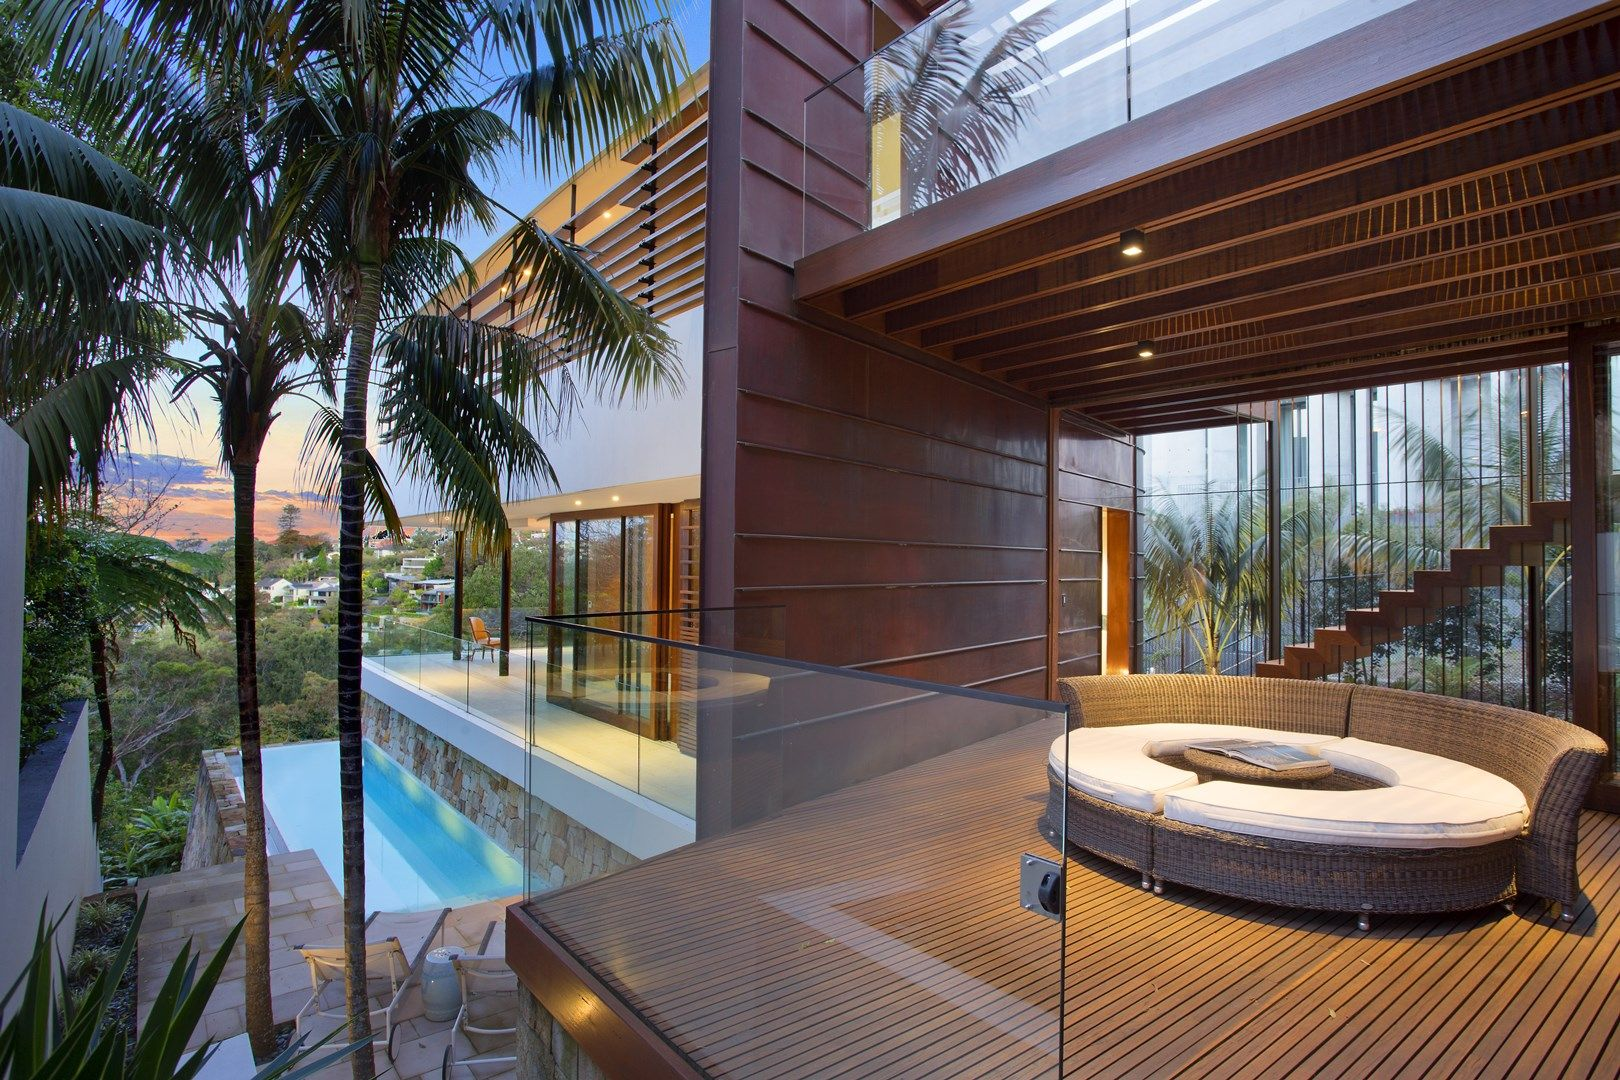 19 Parriwi Road, Mosman NSW 2088 House For Sale